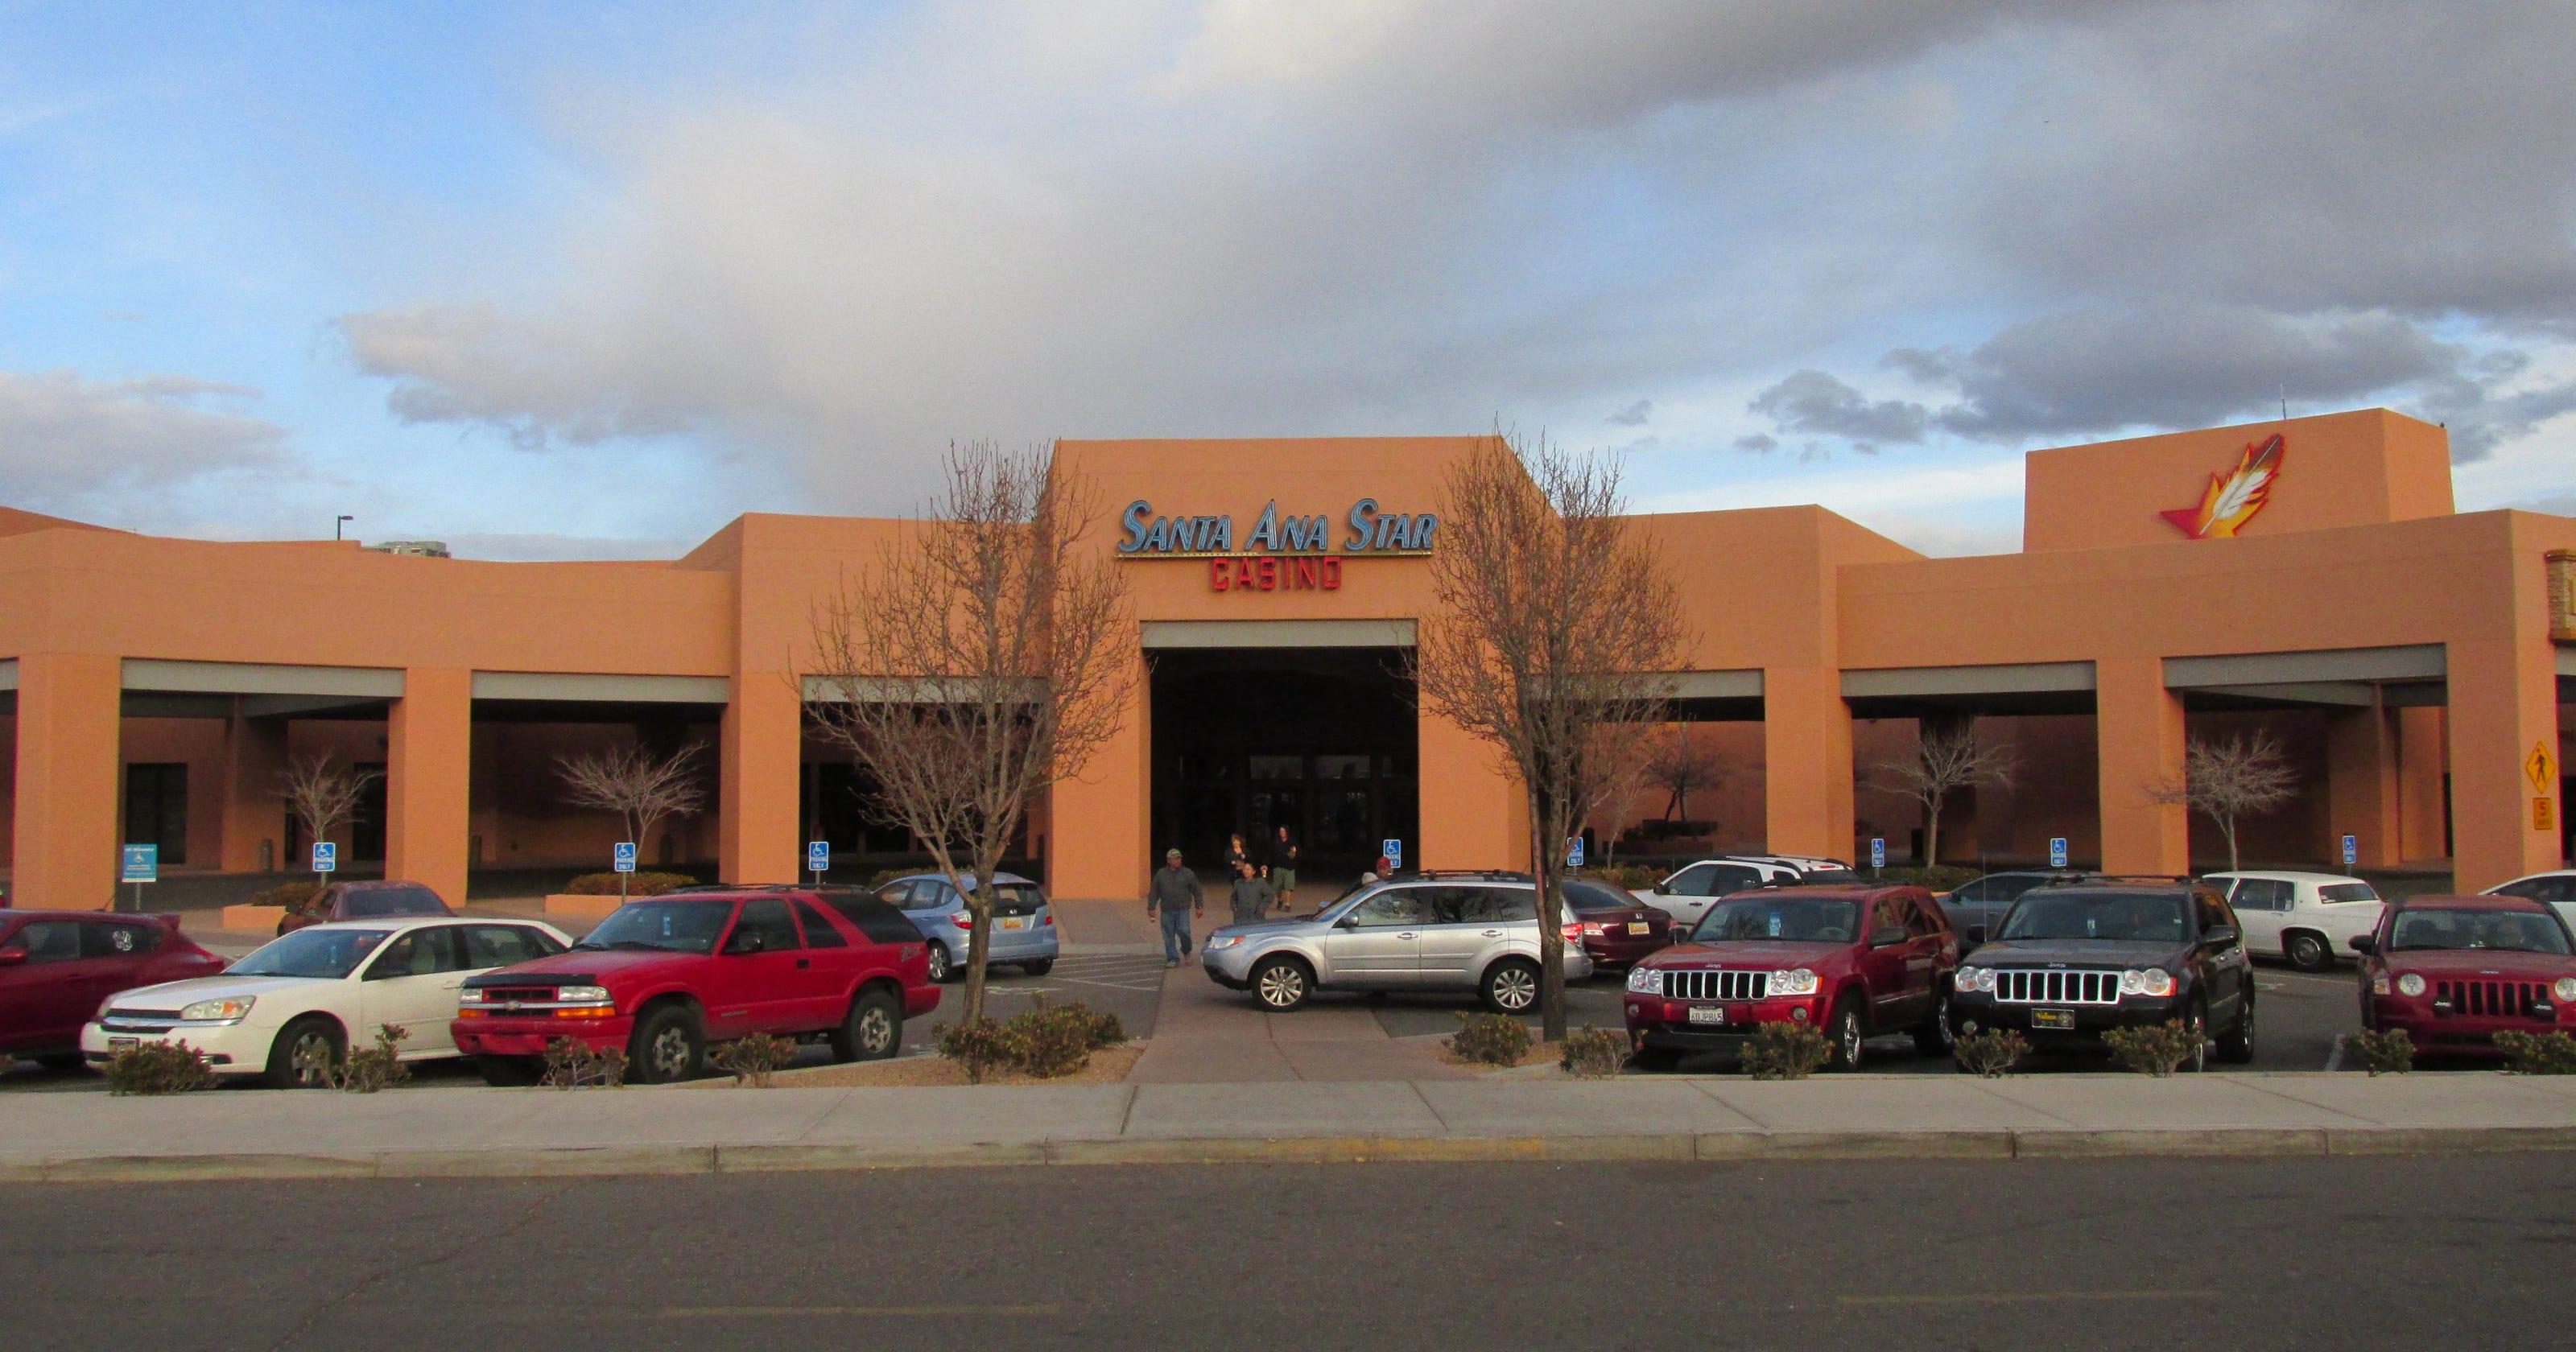 Las Cruces Nm Hotel Deals